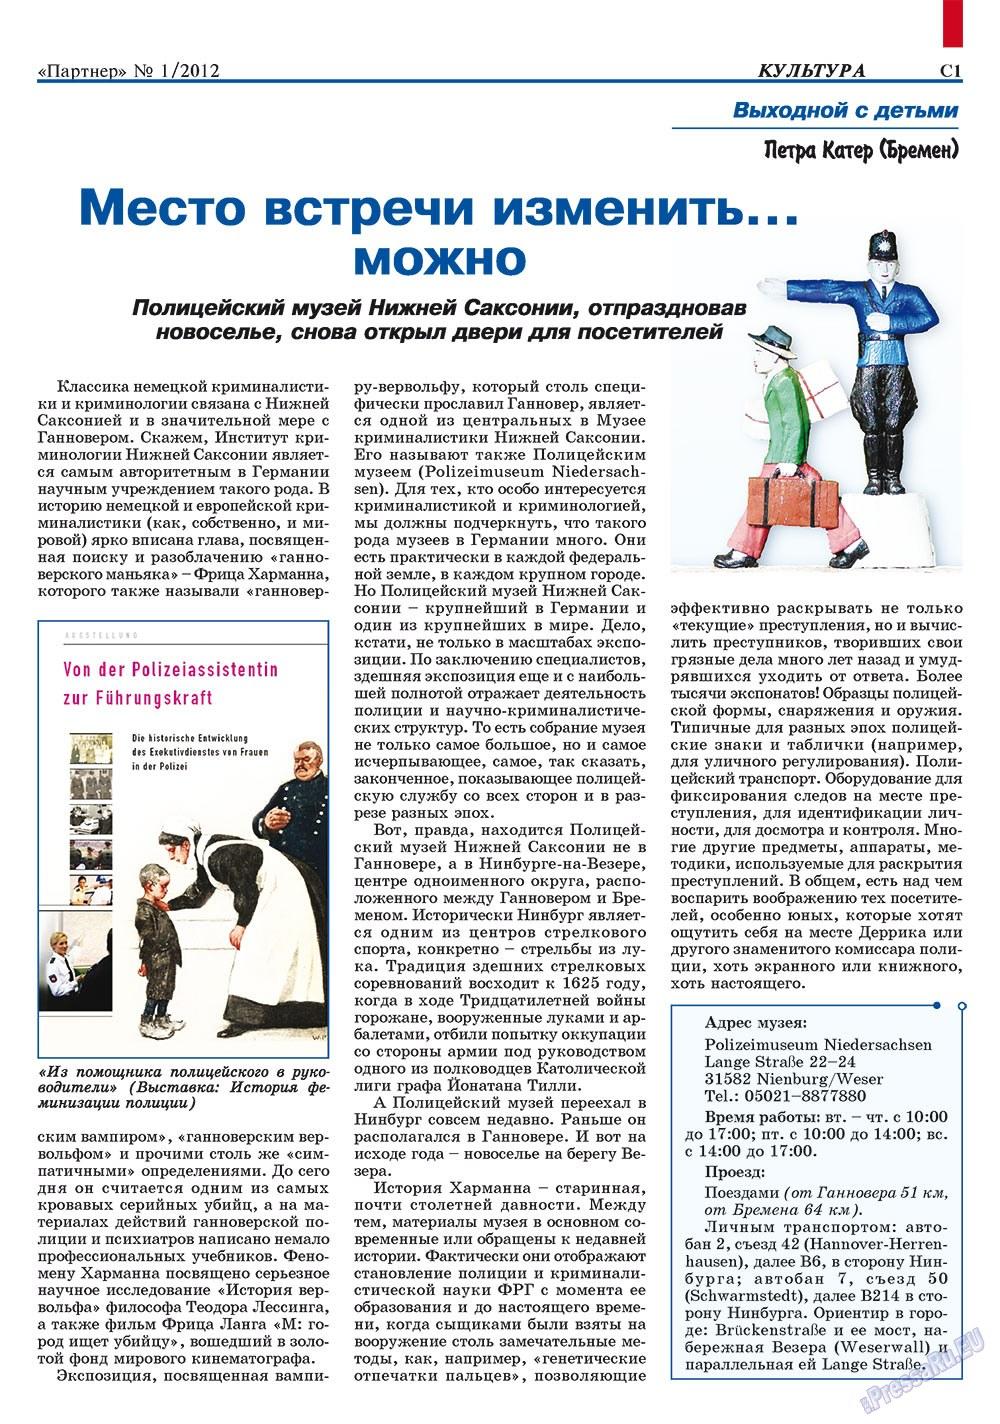 Партнер-север (журнал). 2012 год, номер 1, стр. 59